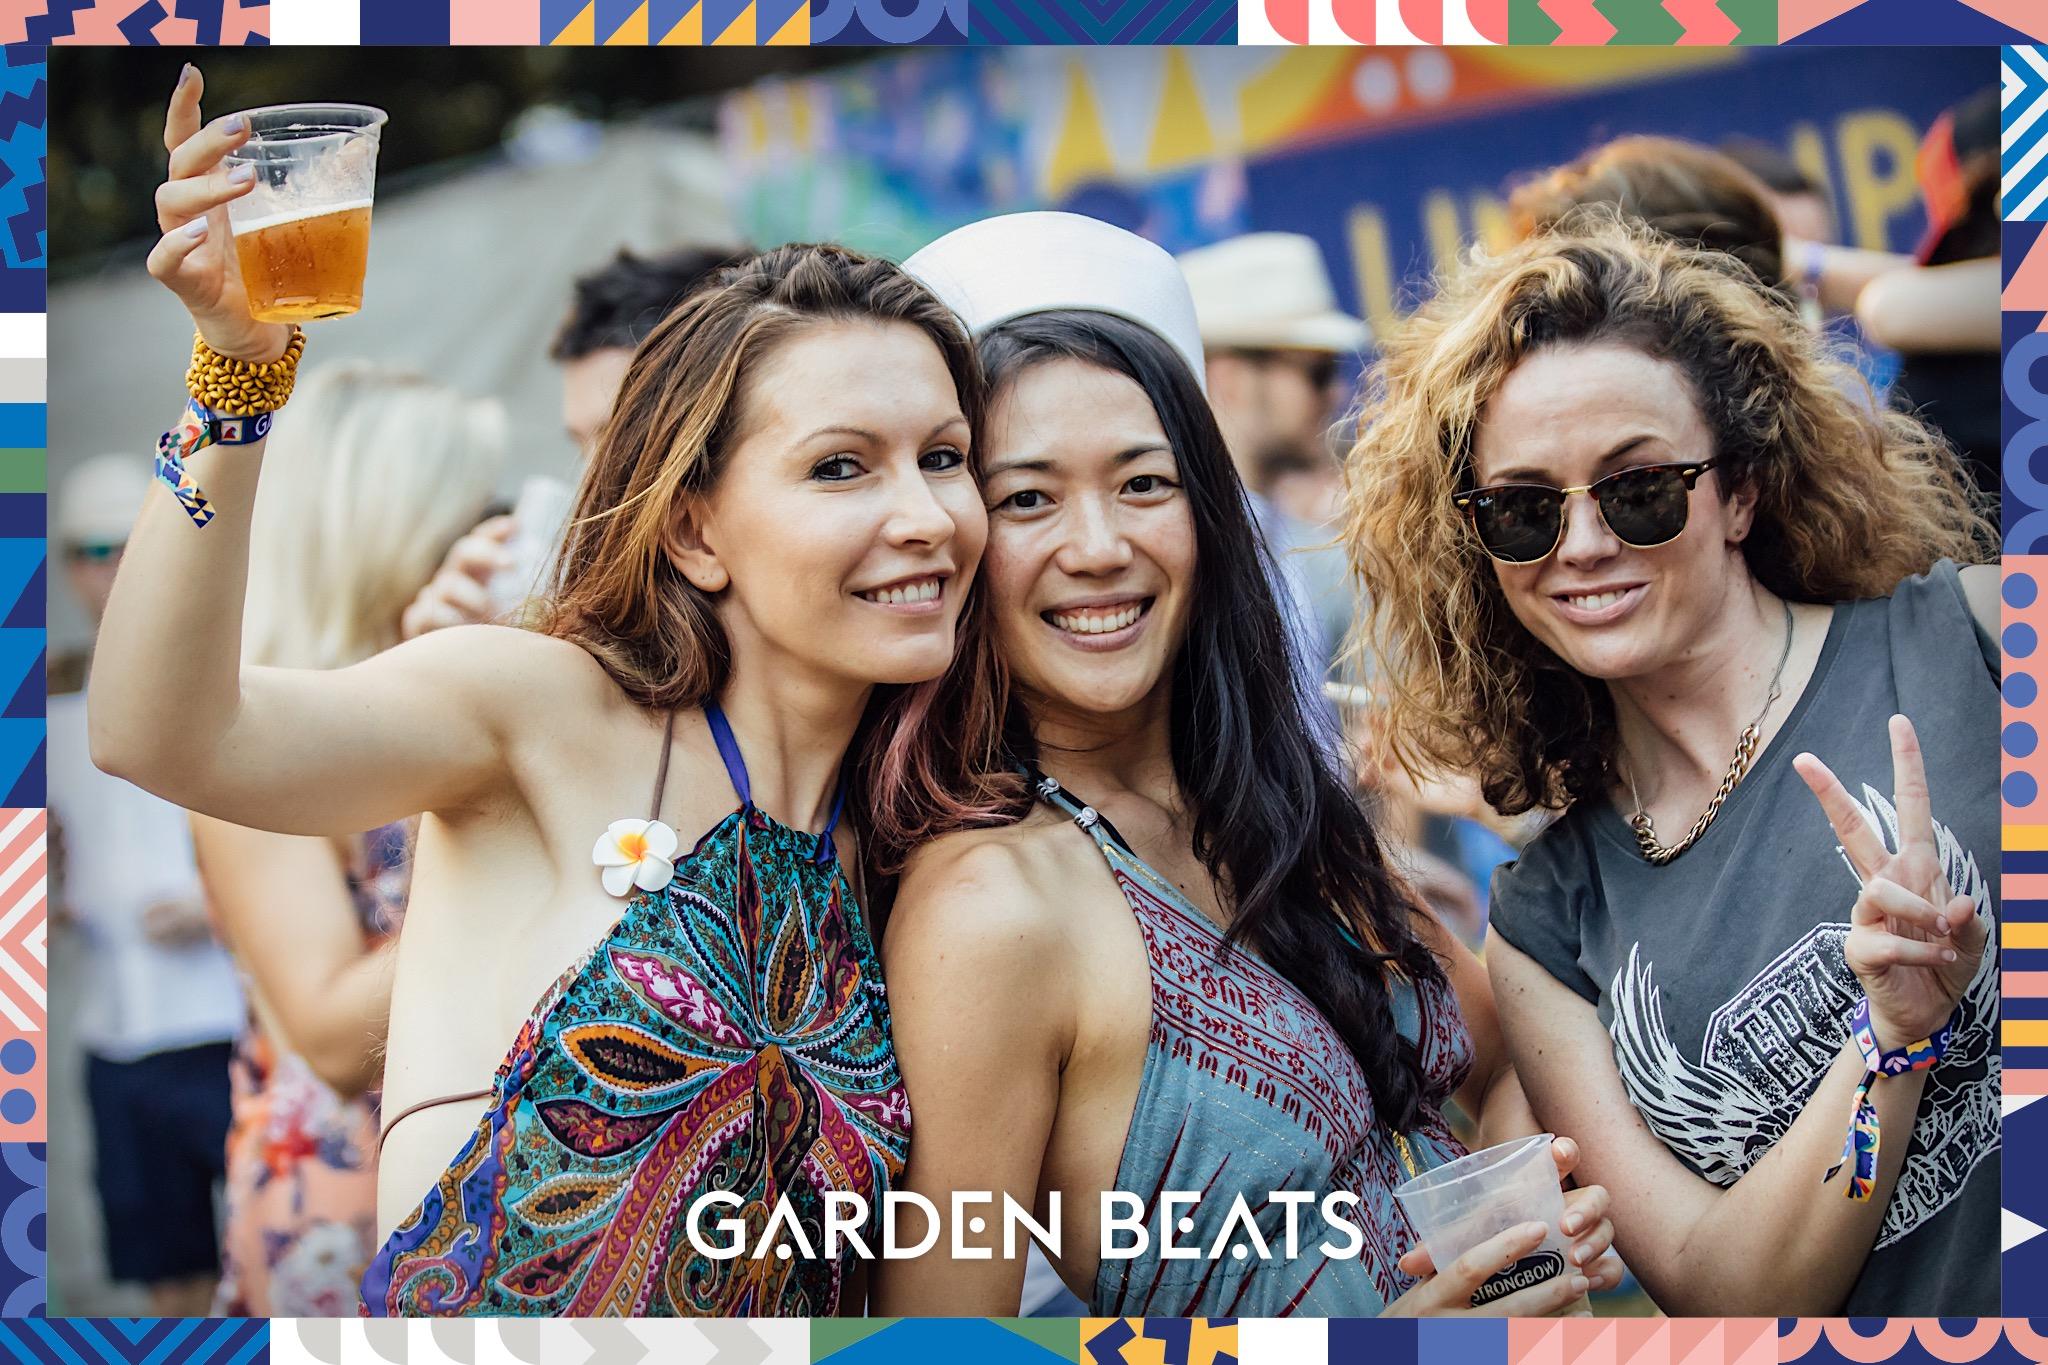 18032017_GardenBeats_Colossal563_WatermarkedGB.jpg